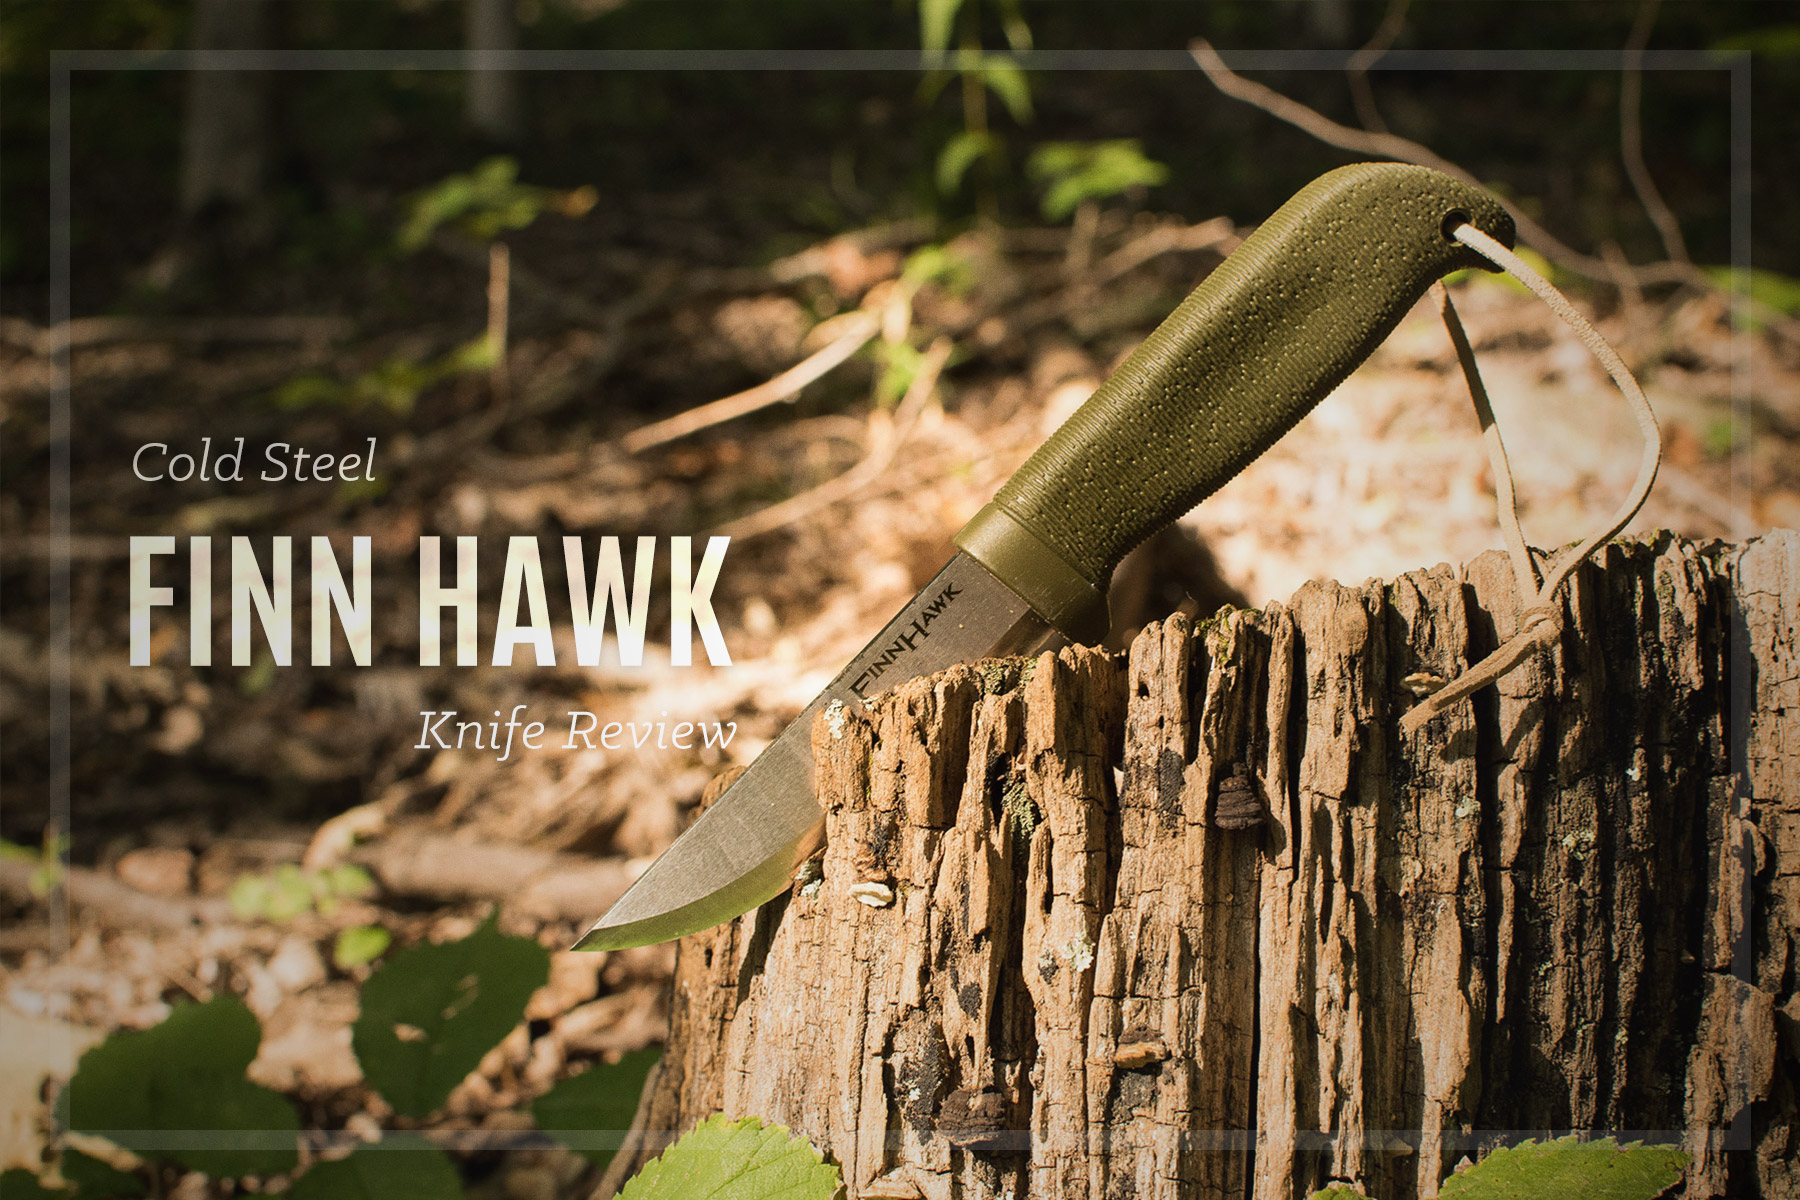 Cold Steel Finn Hawk Review